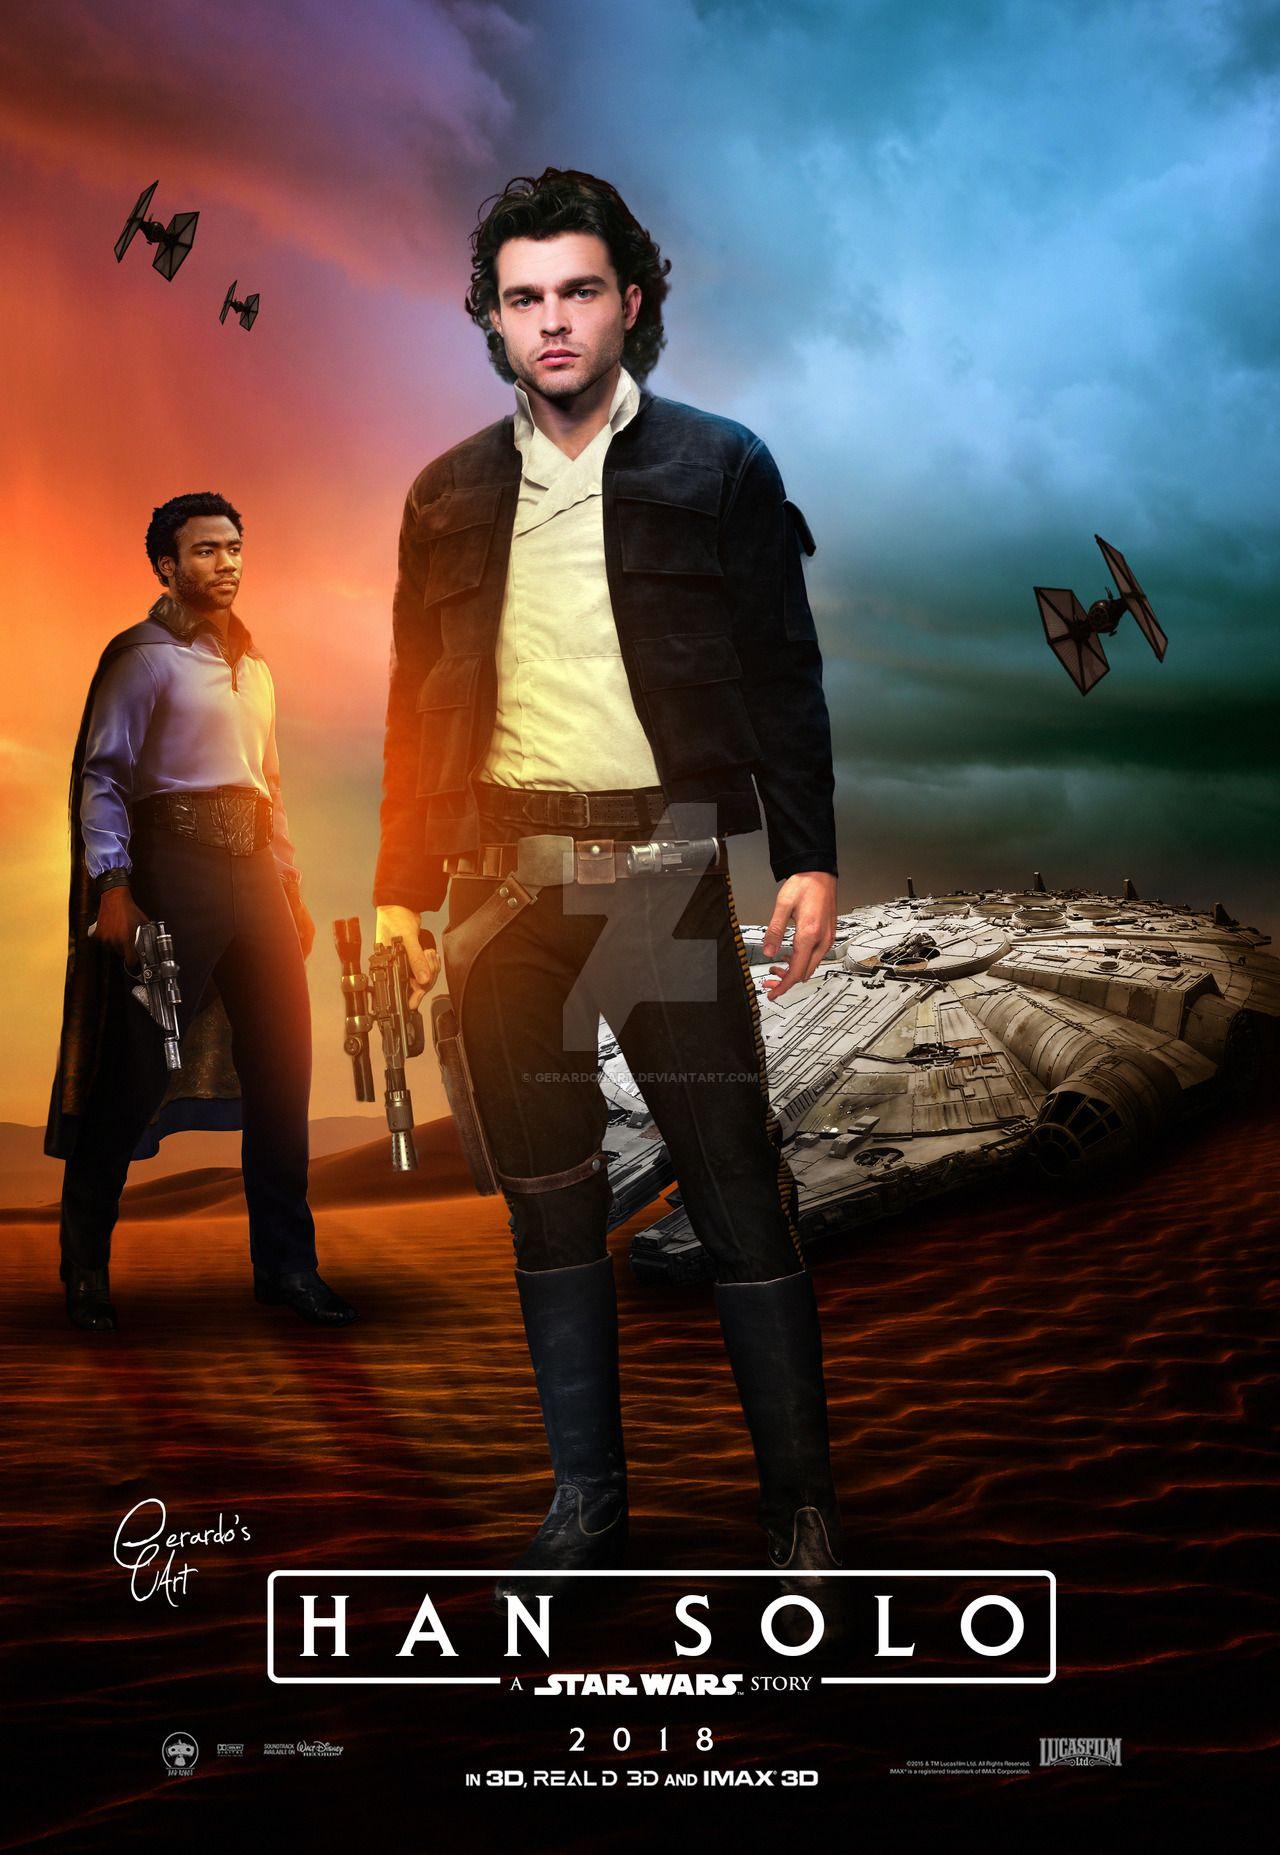 Solo: Star Wars 8 - 2018 film 22